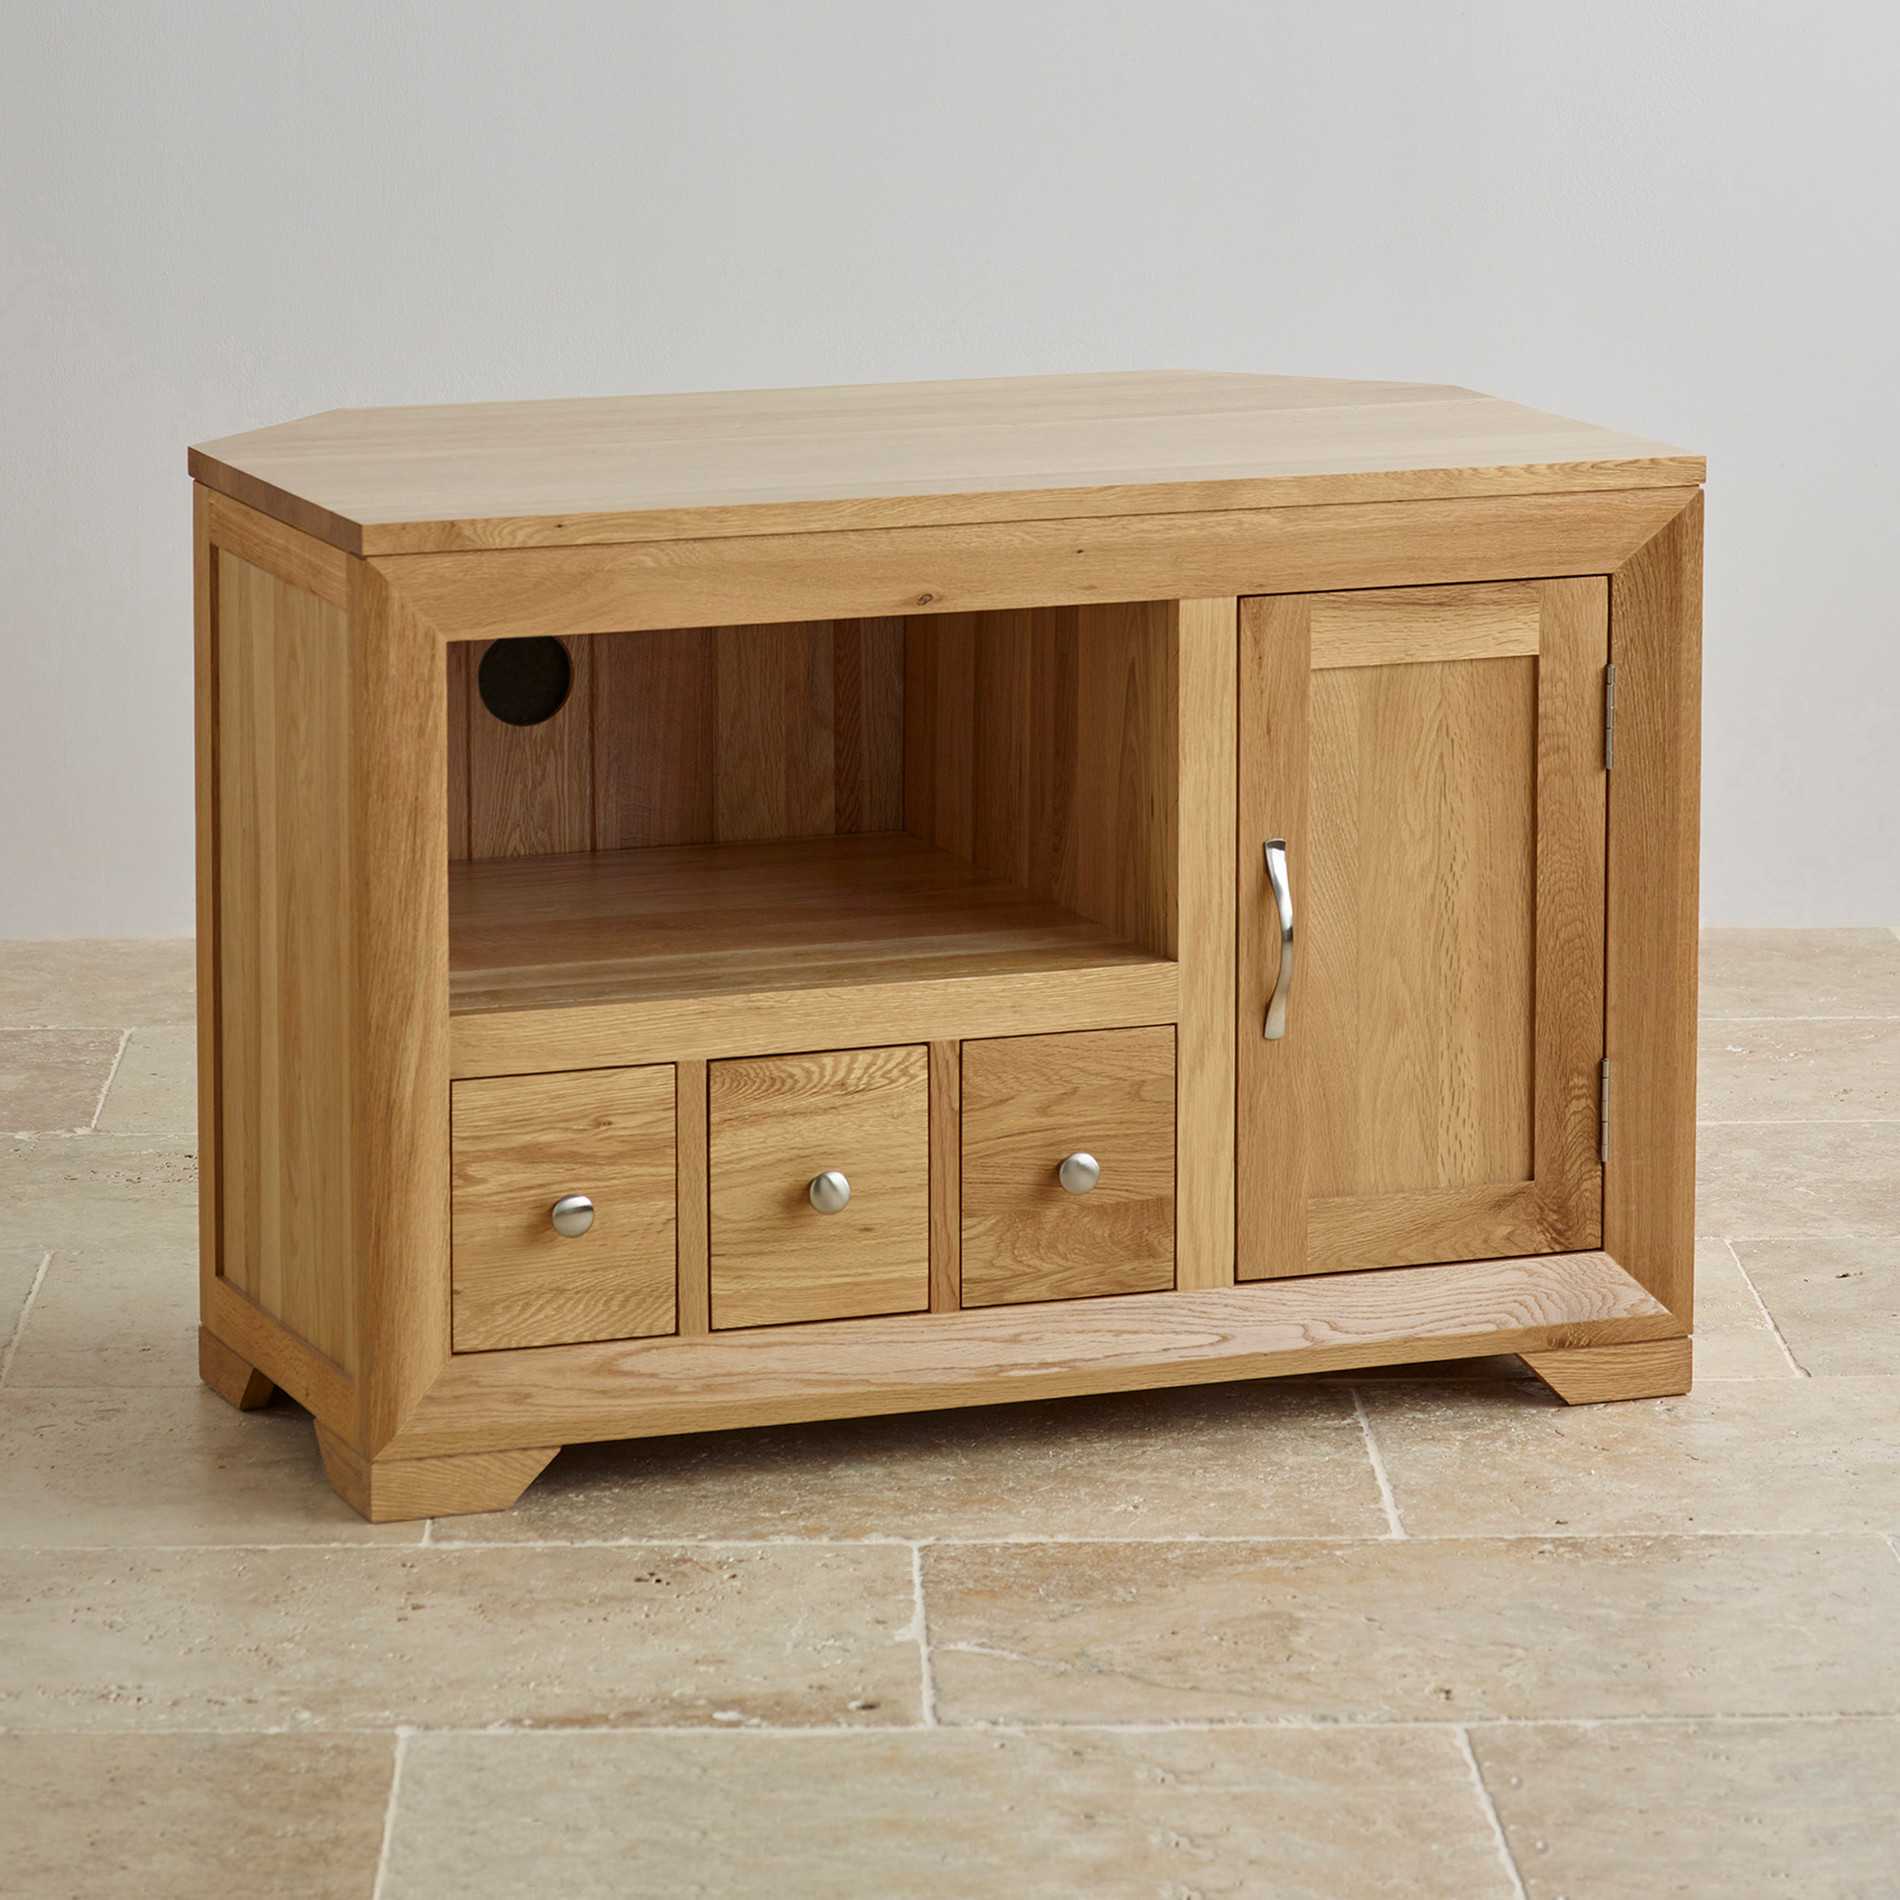 Bevel Small Corner TV Cabinet in Solid Oak